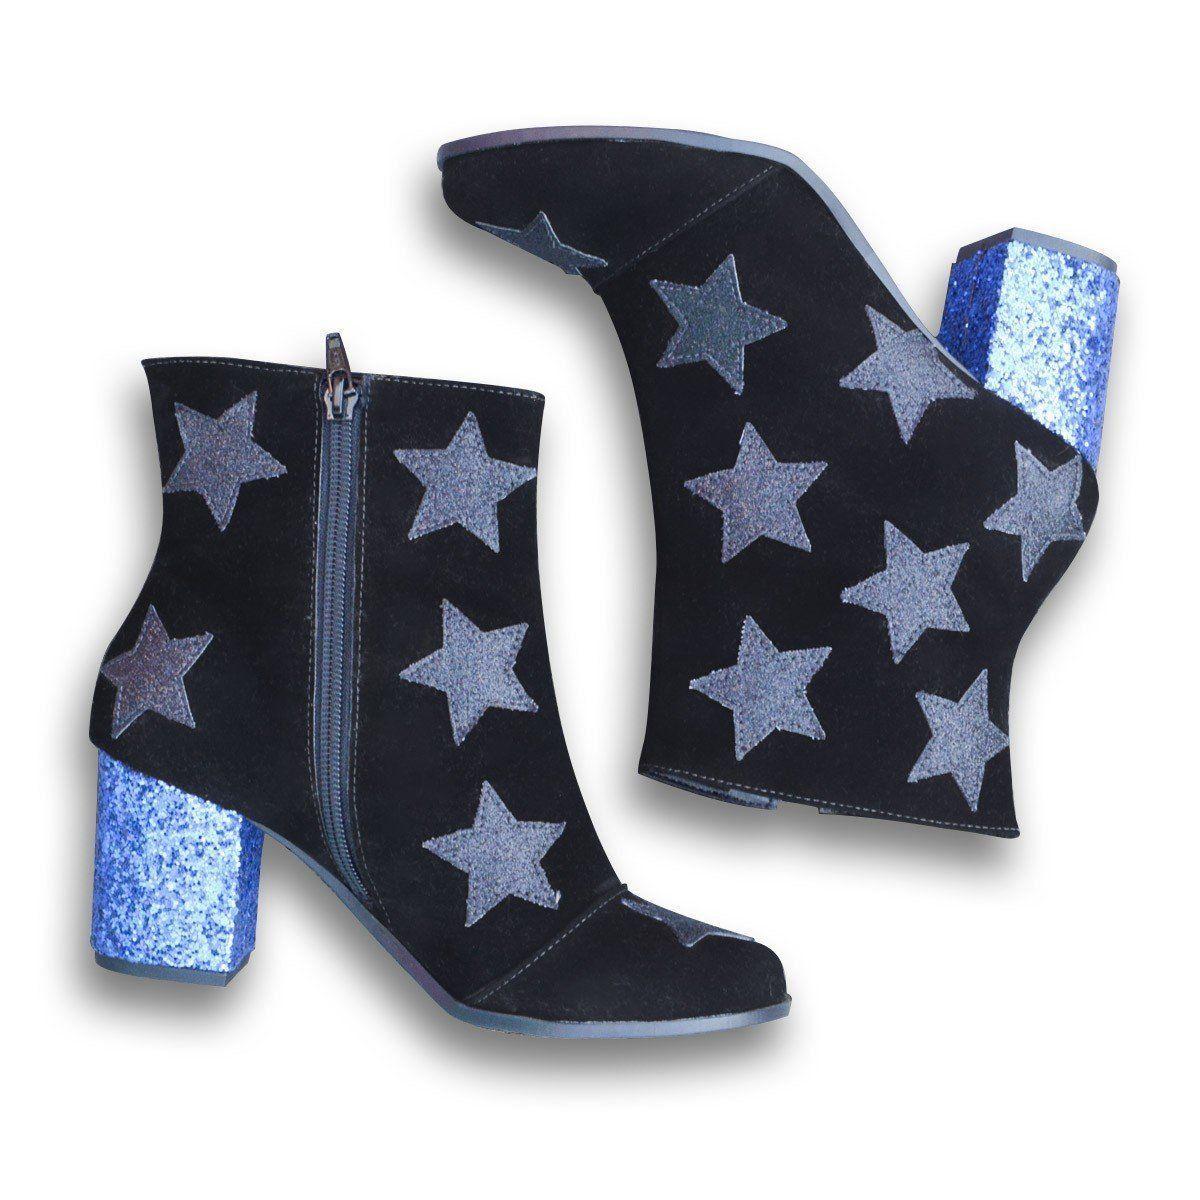 Bota DC Comics Star Glitter  - bandUP Store Marketplace